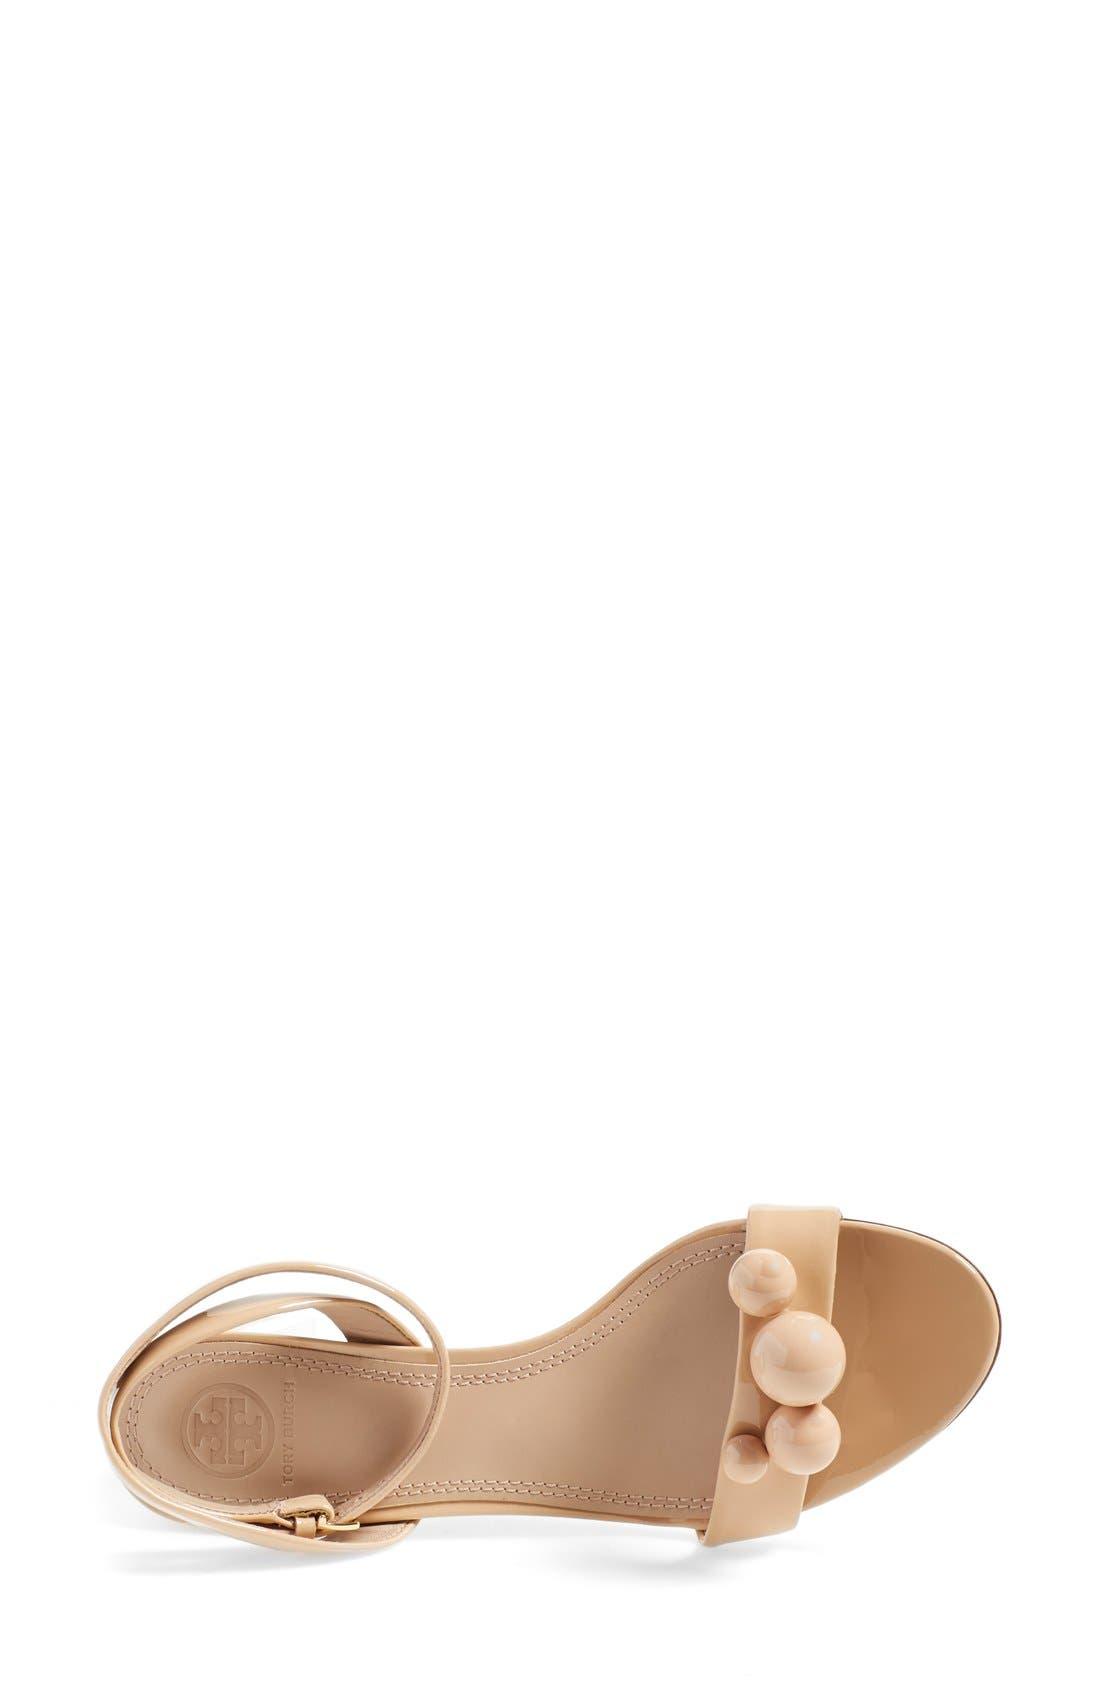 Alternate Image 3  - Tory Burch 'Disco' Sandal (Women)